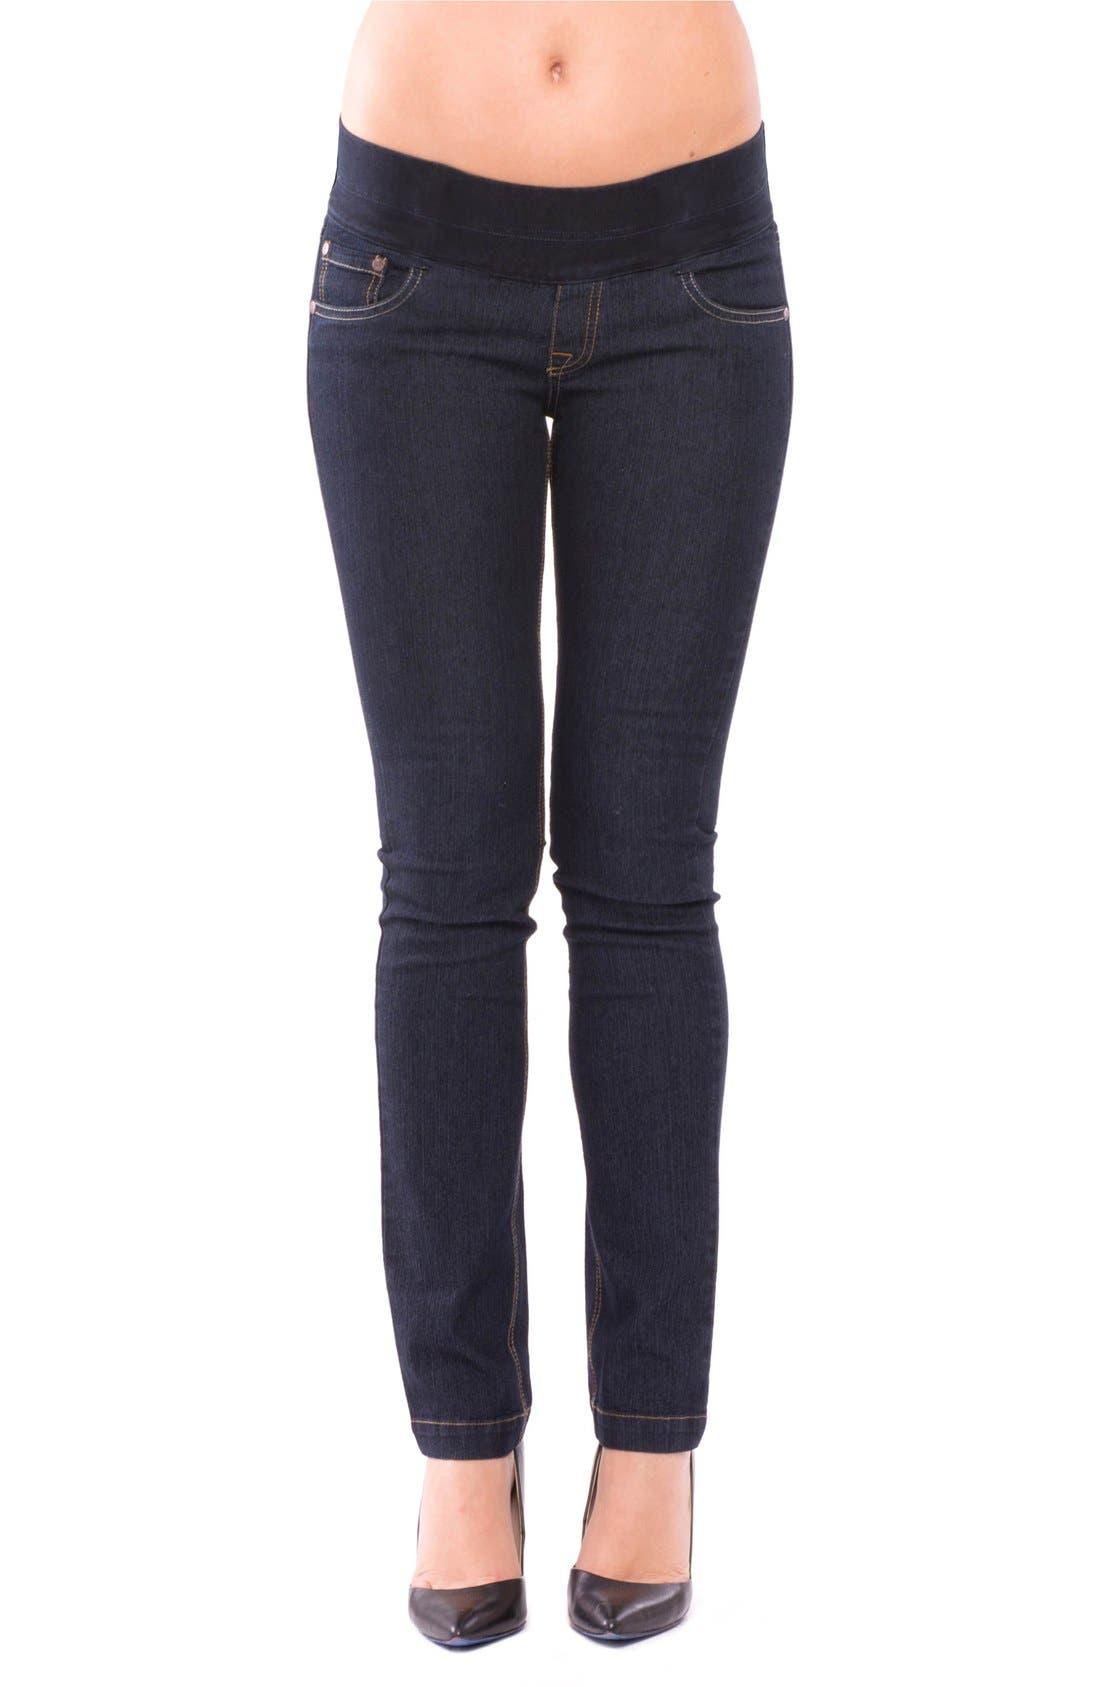 OLIAN 'Geni' Maternity Skinny Jeans